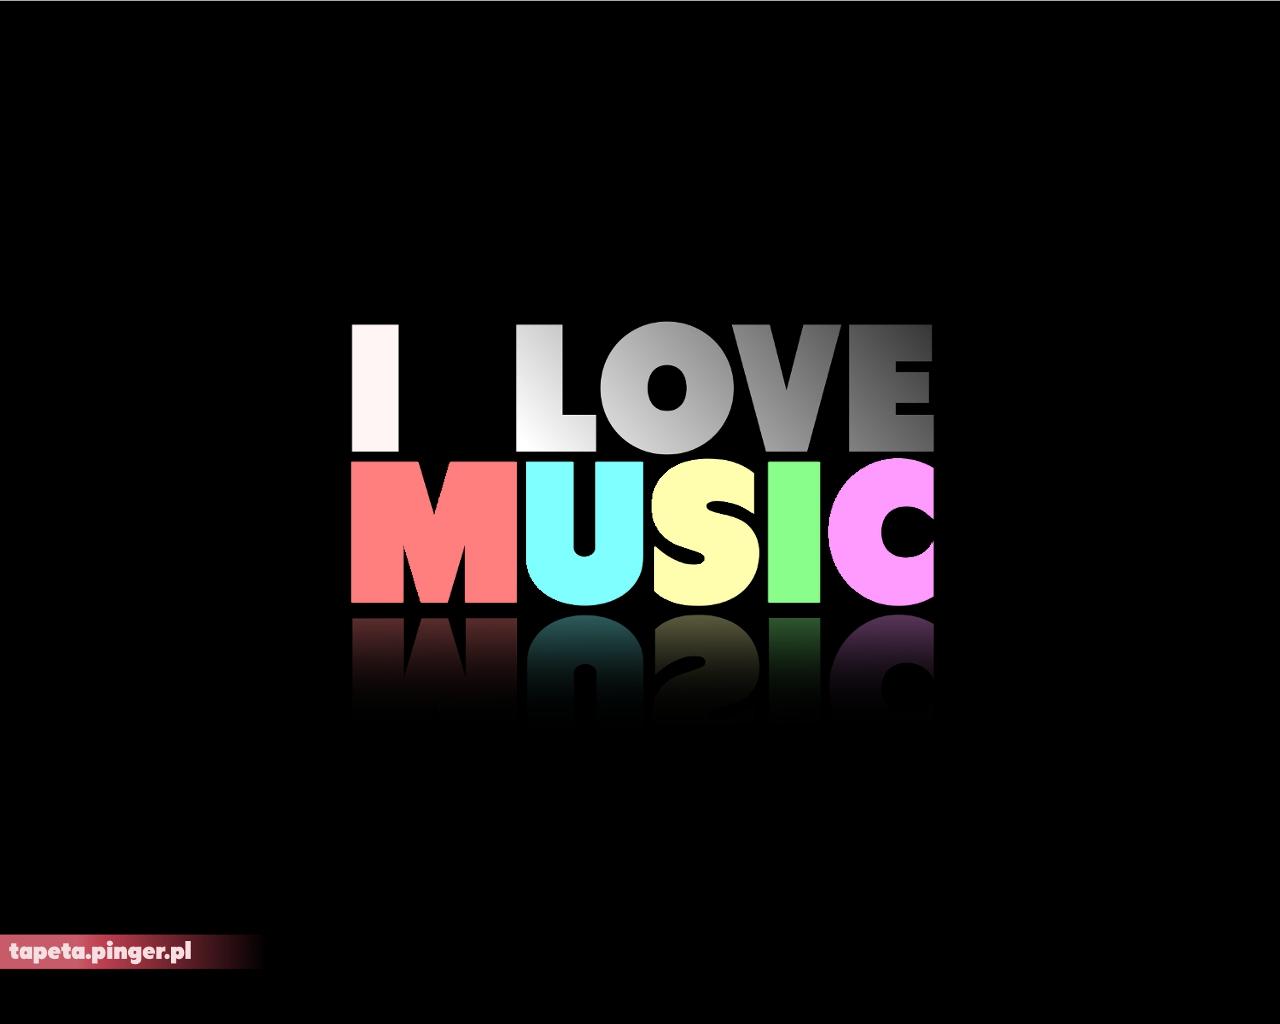 I_LOVE12-10